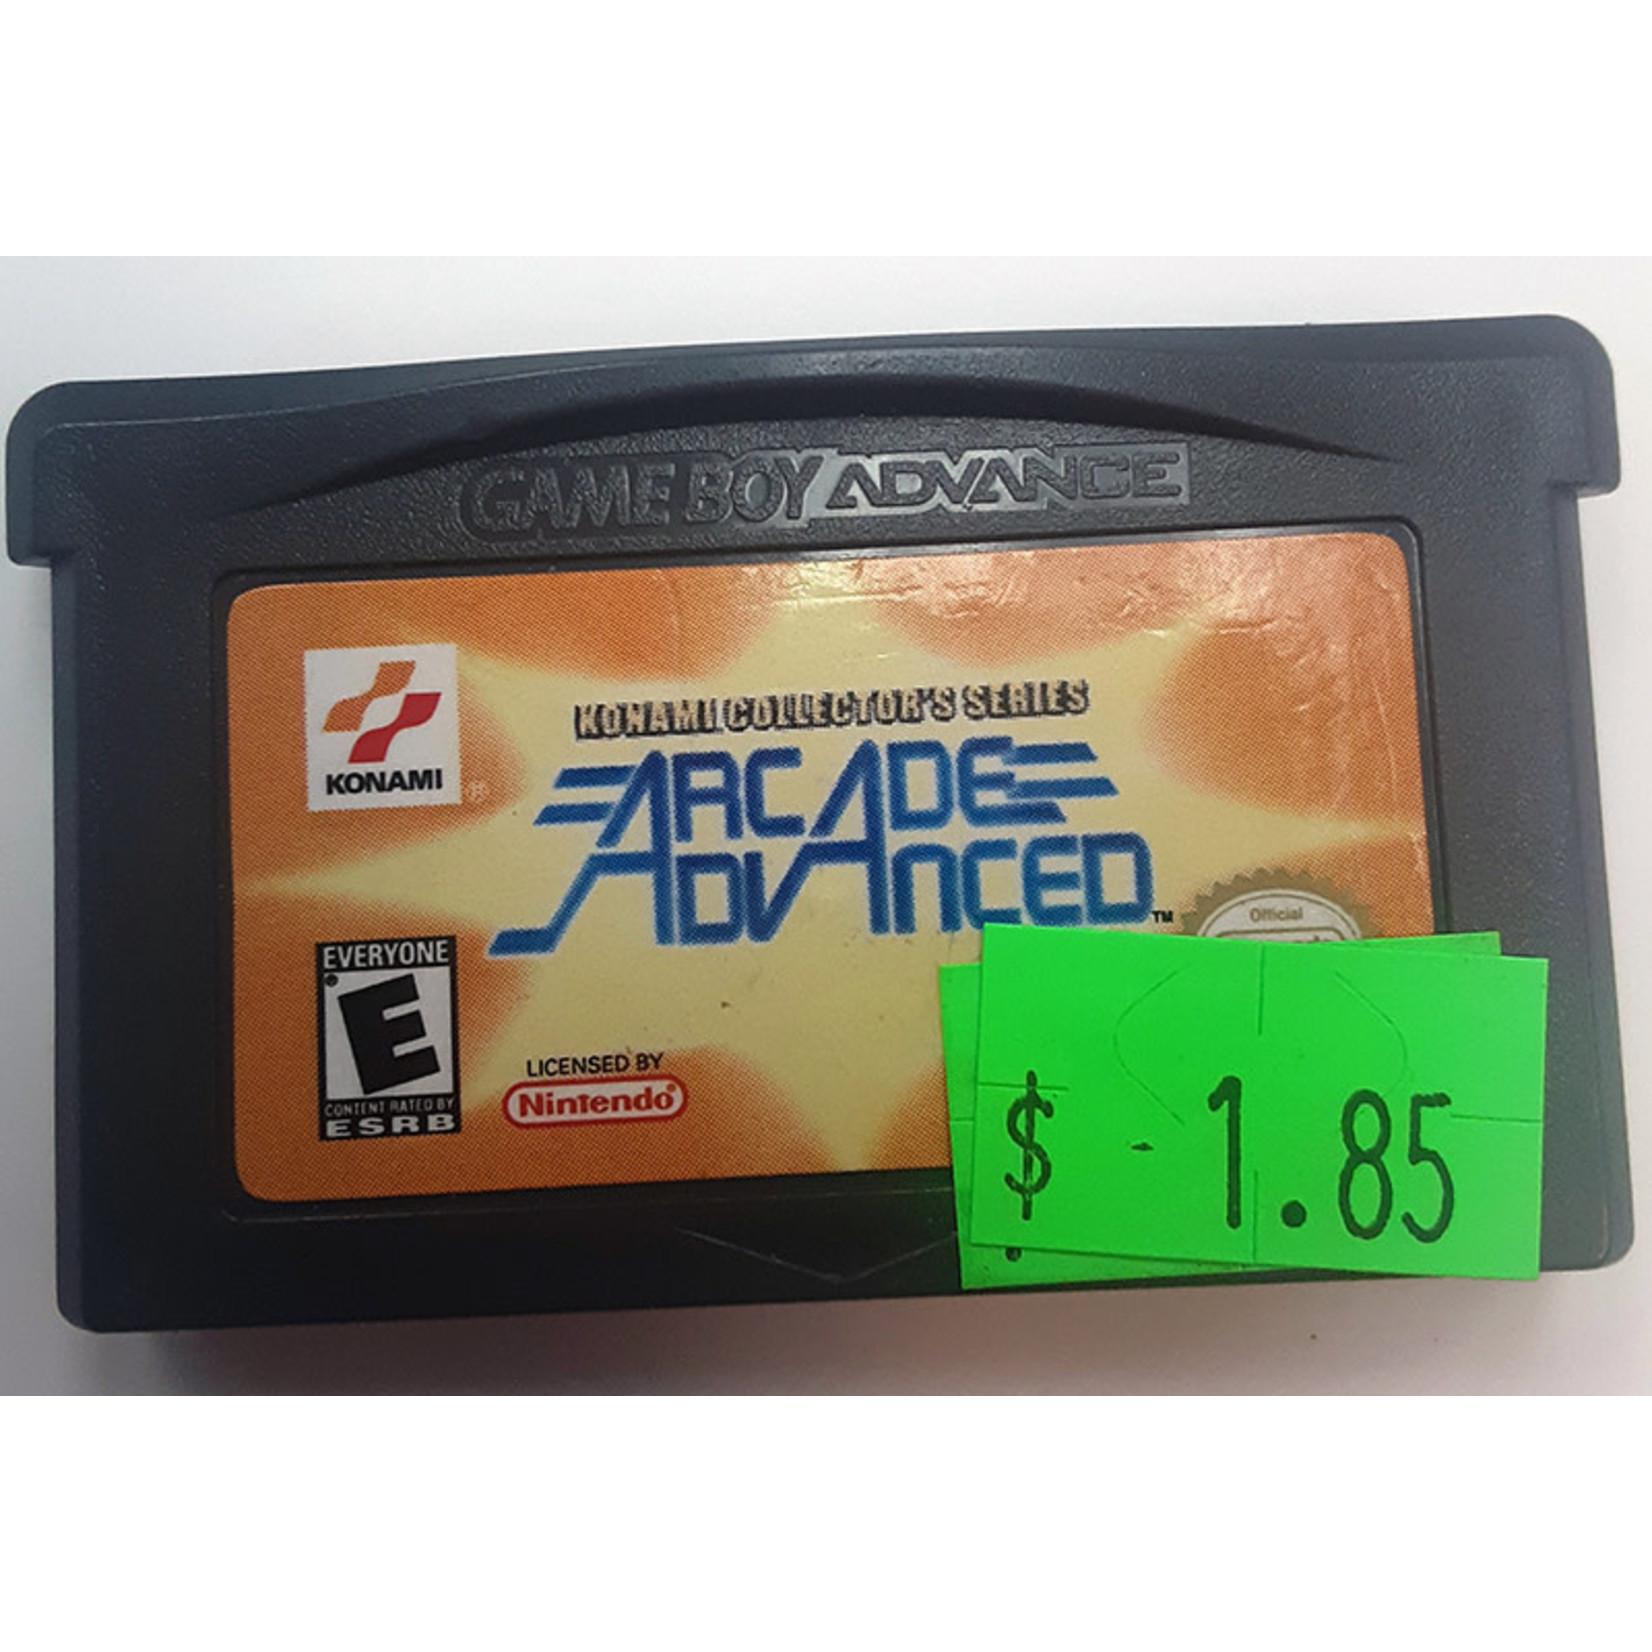 GBAu-Konami Collector's Series Arcade Advanced (cartridge)